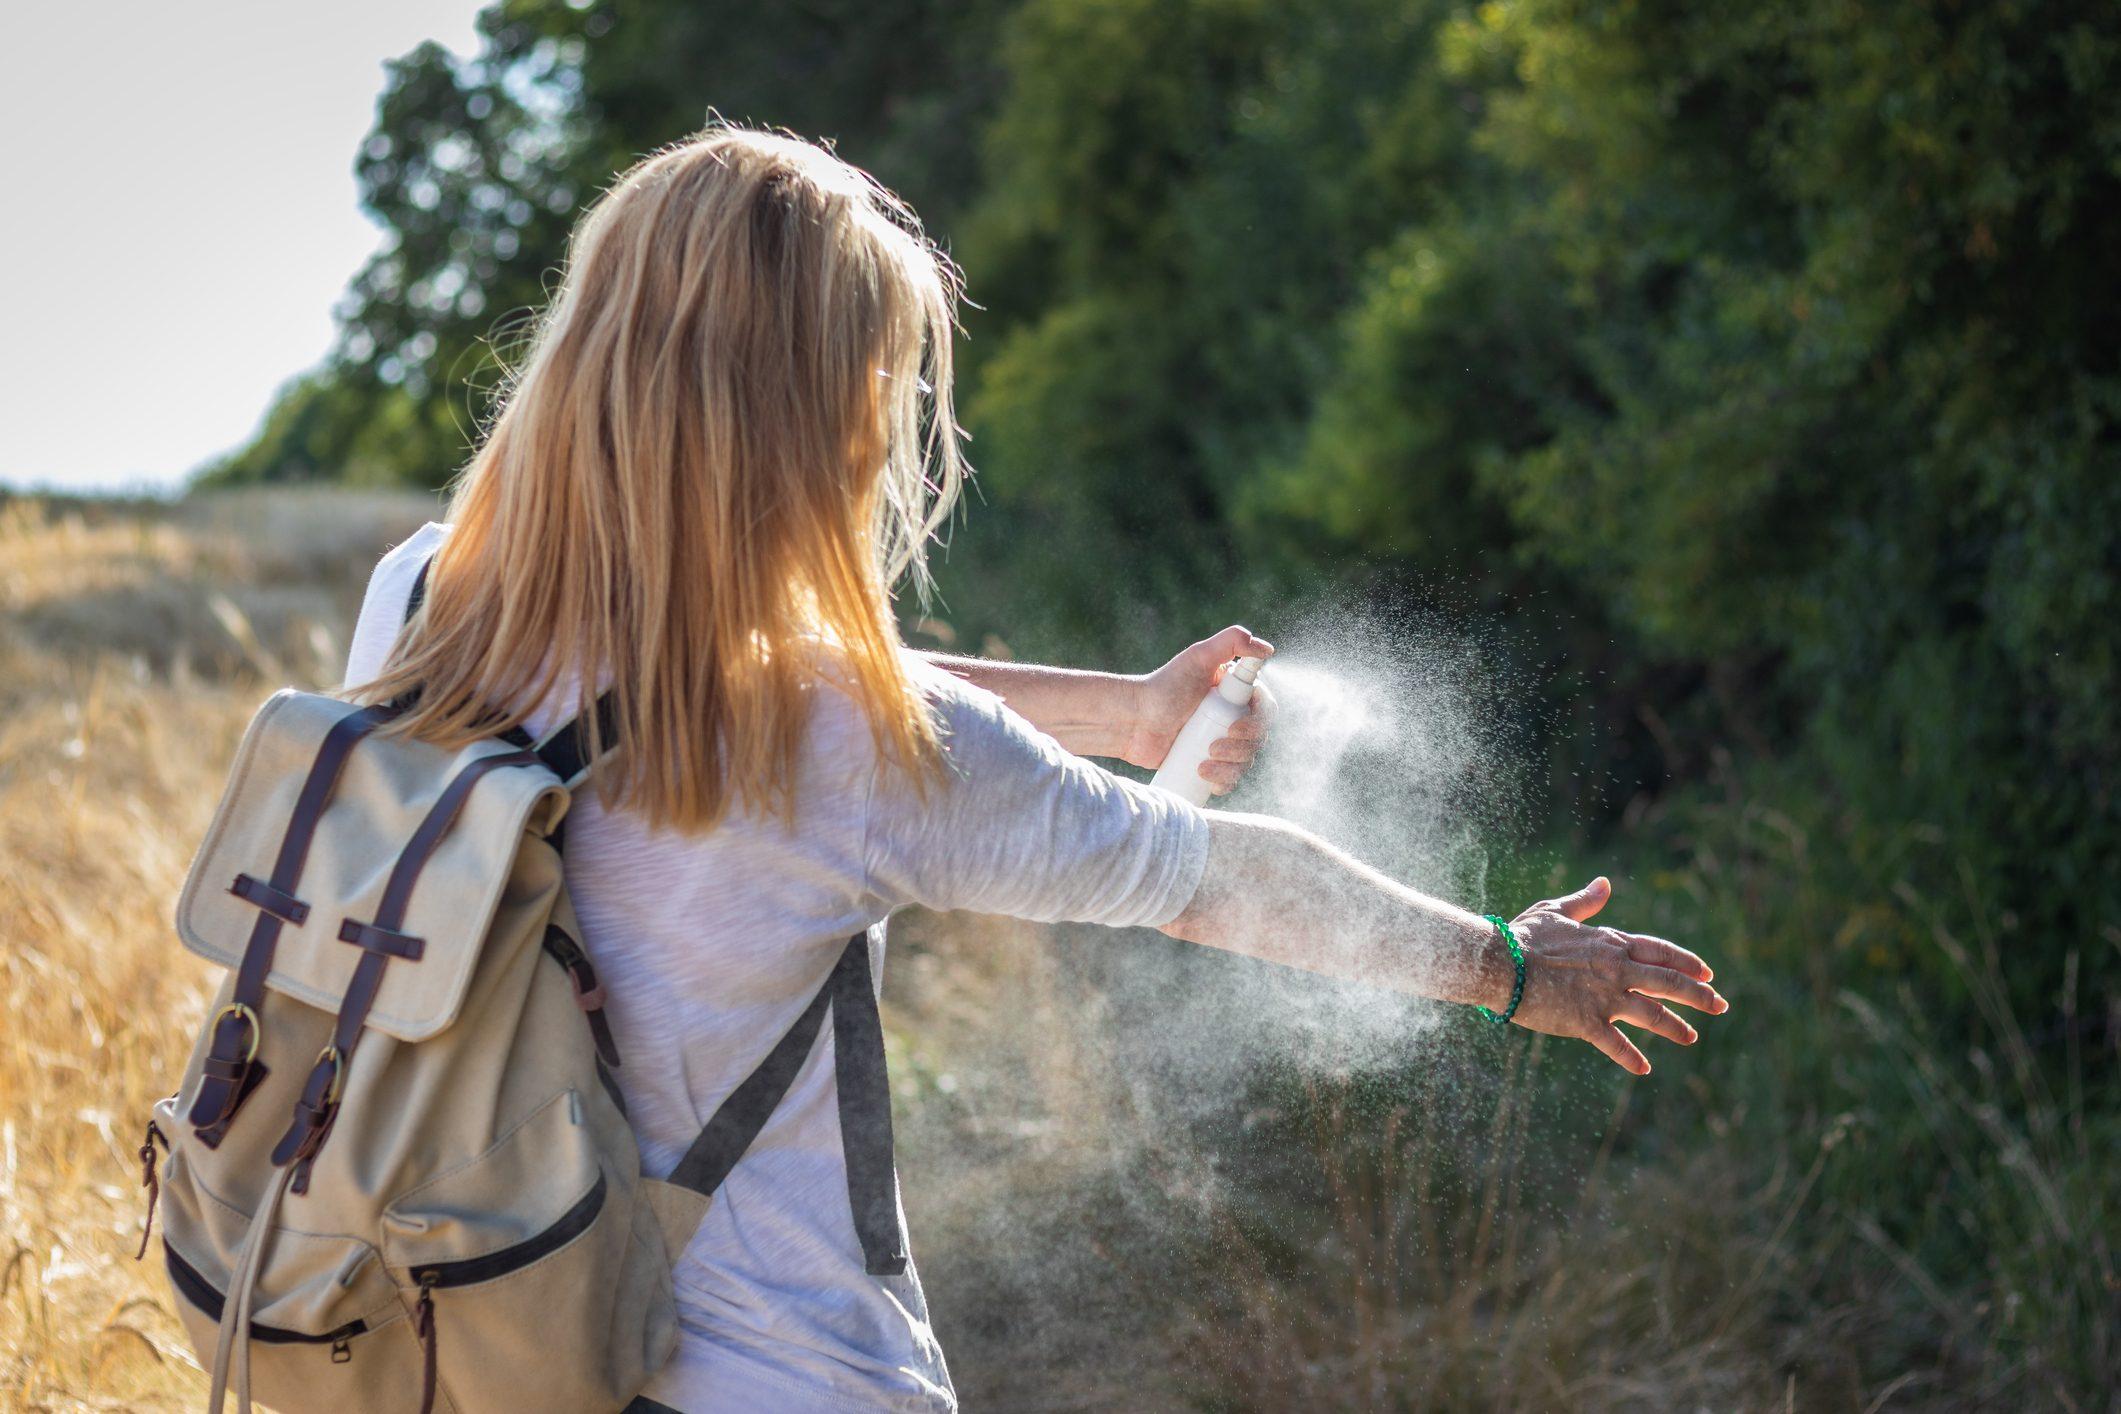 woman applying bug spray to arm